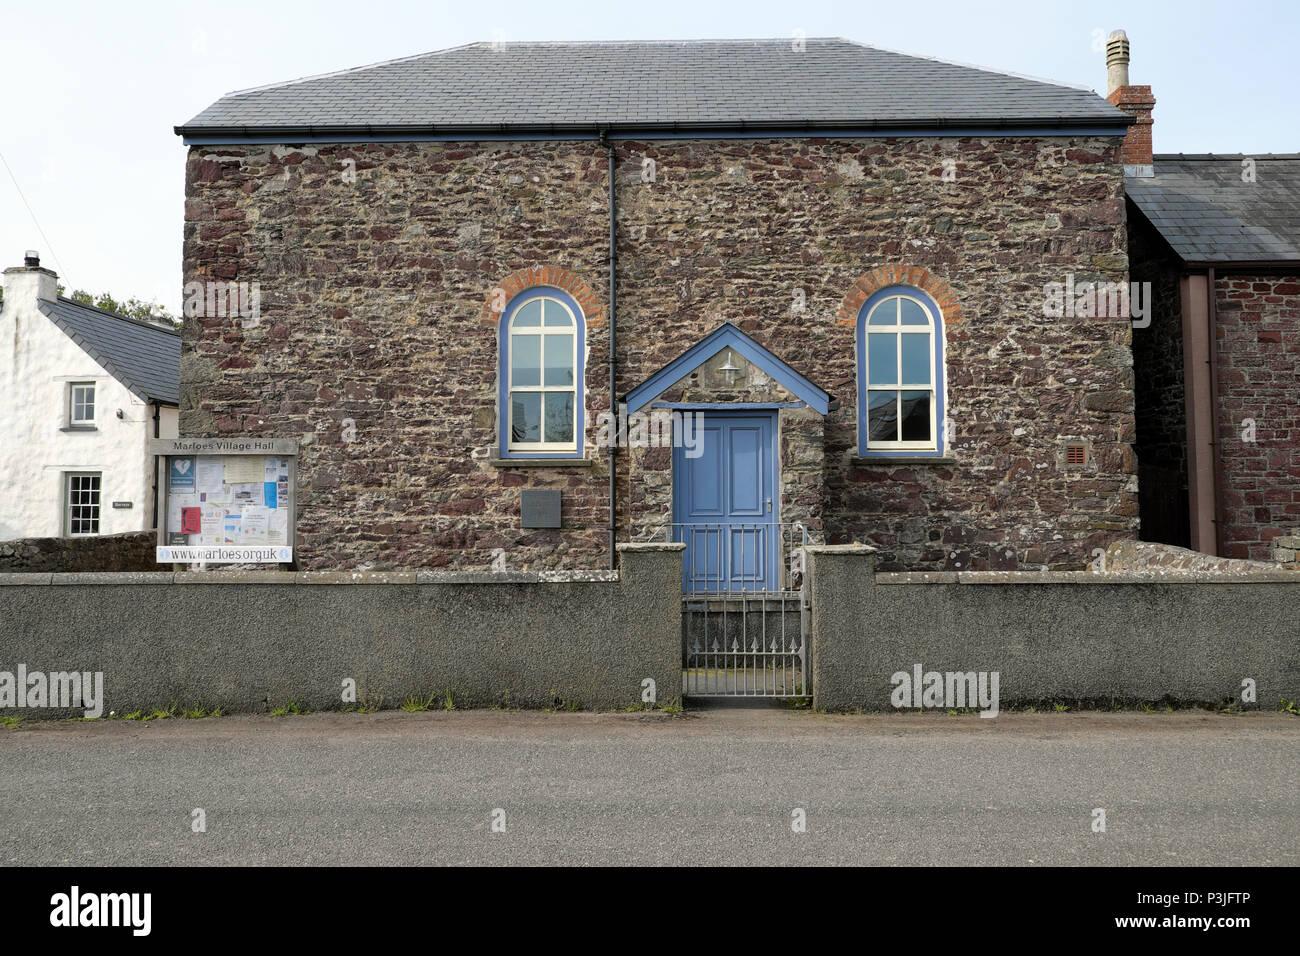 Marloes Village Hall historical stone building entrance door in Pembrokeshire West Wales, UK  KATHY DEWITT - Stock Image